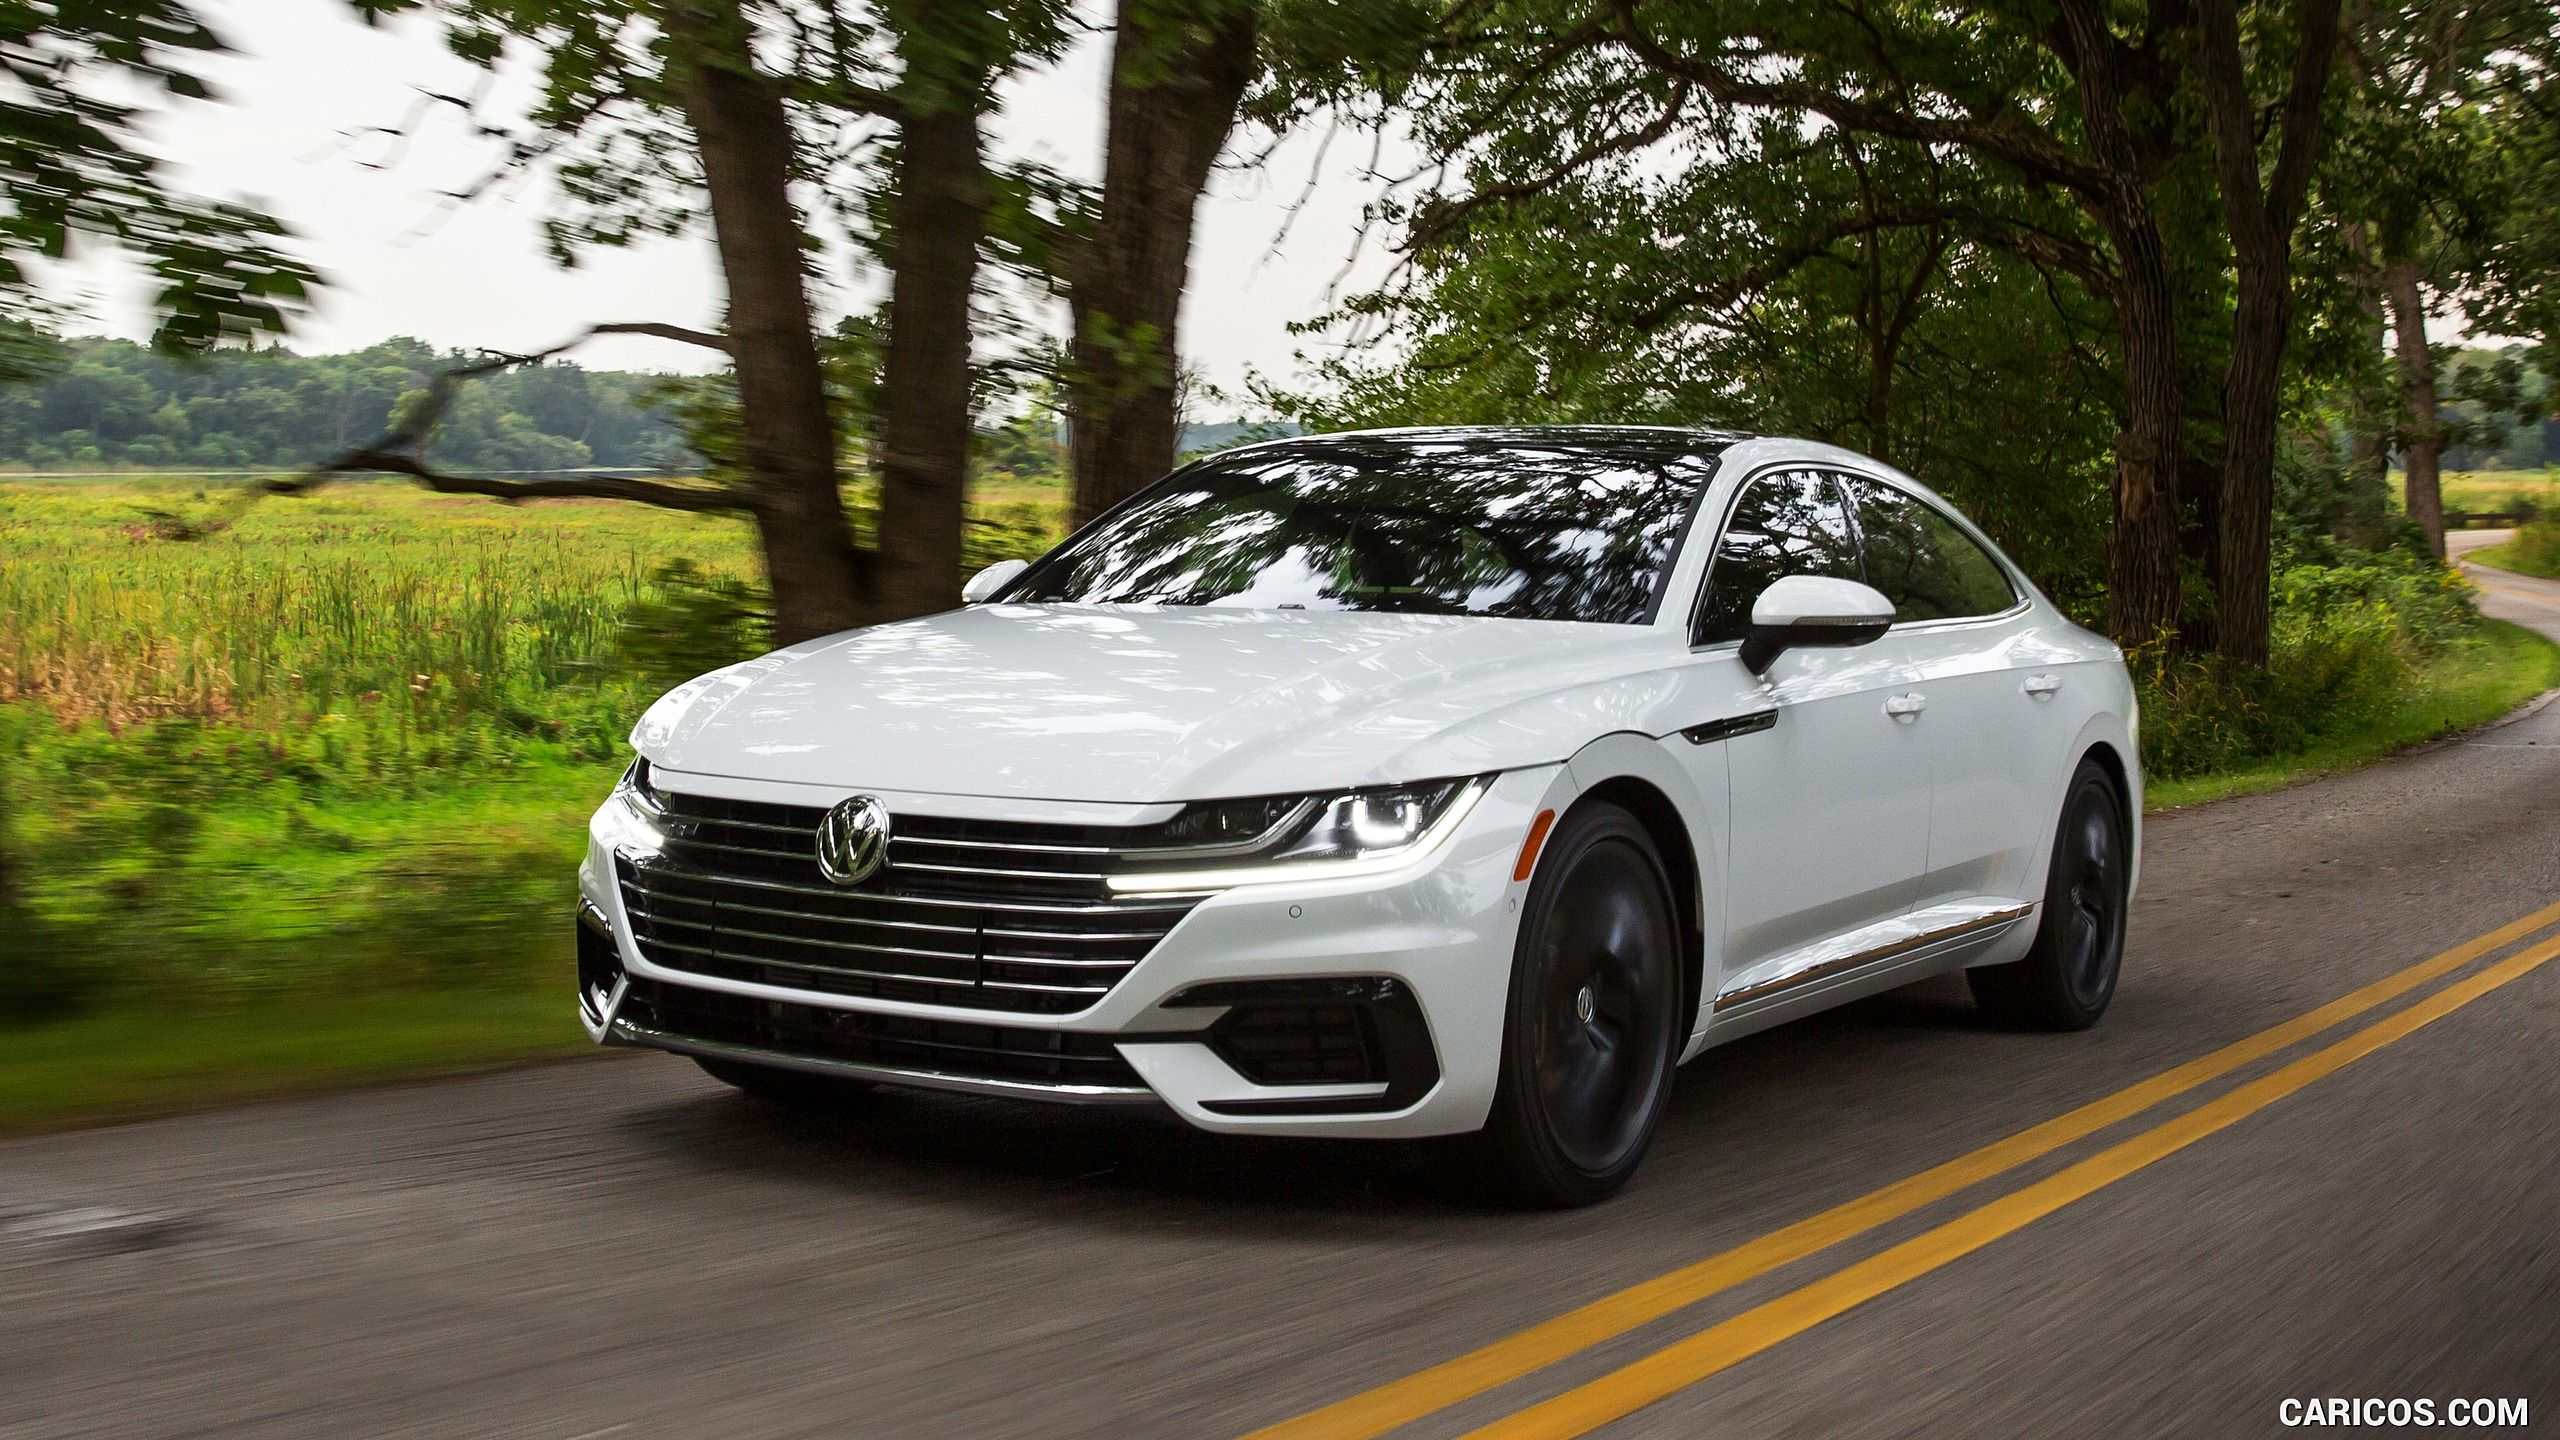 2019 Volkswagen Arteon R-Line (US-Spec) – Front Three-Quarter HD